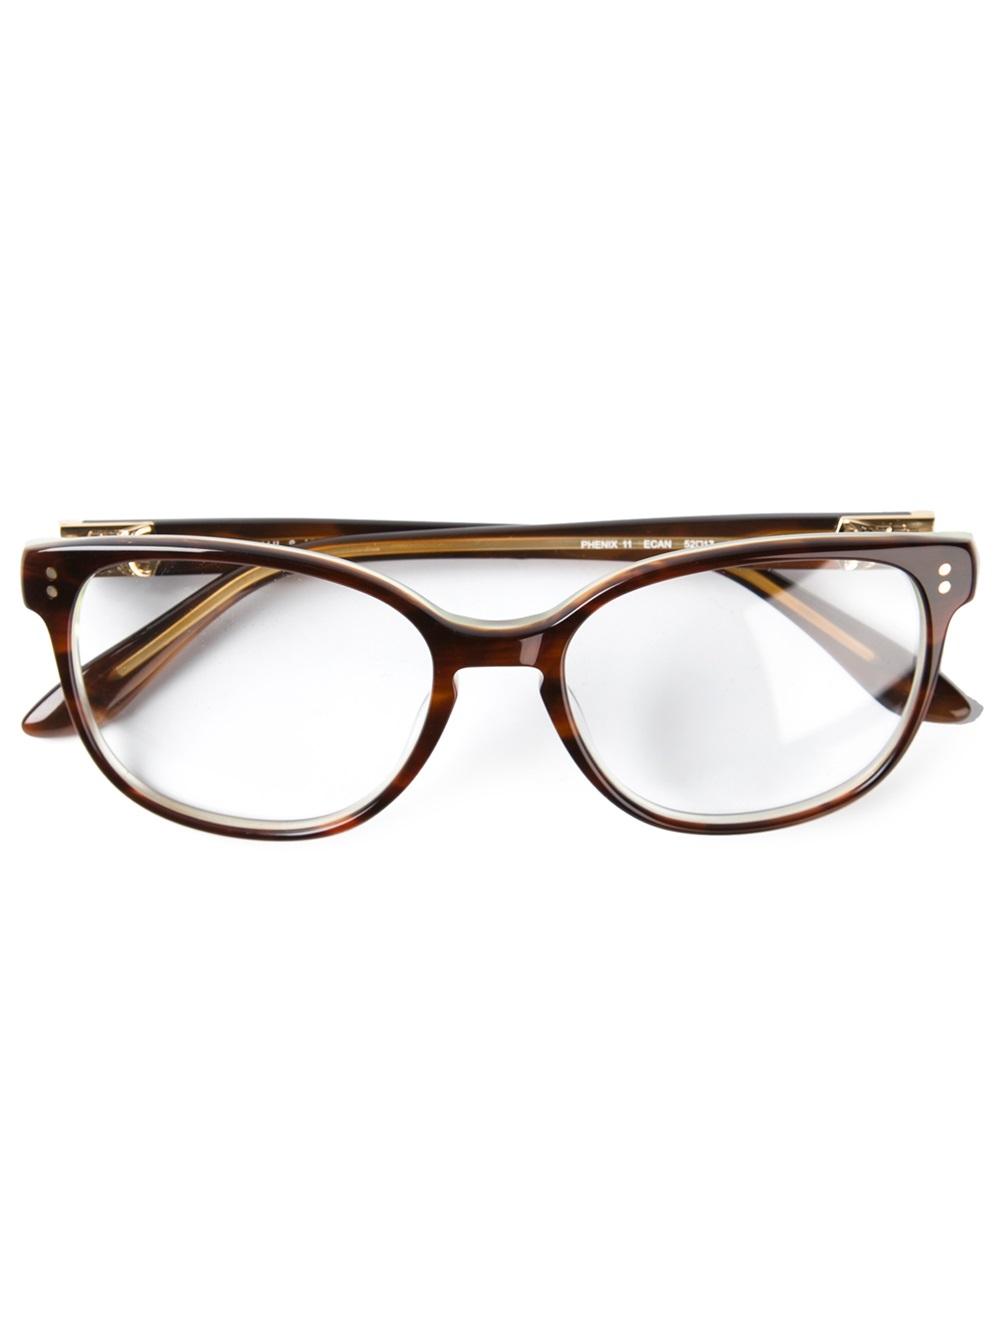 40cb2efd4c357 Lyst - Paul   Joe Phoenix Glasses in Brown